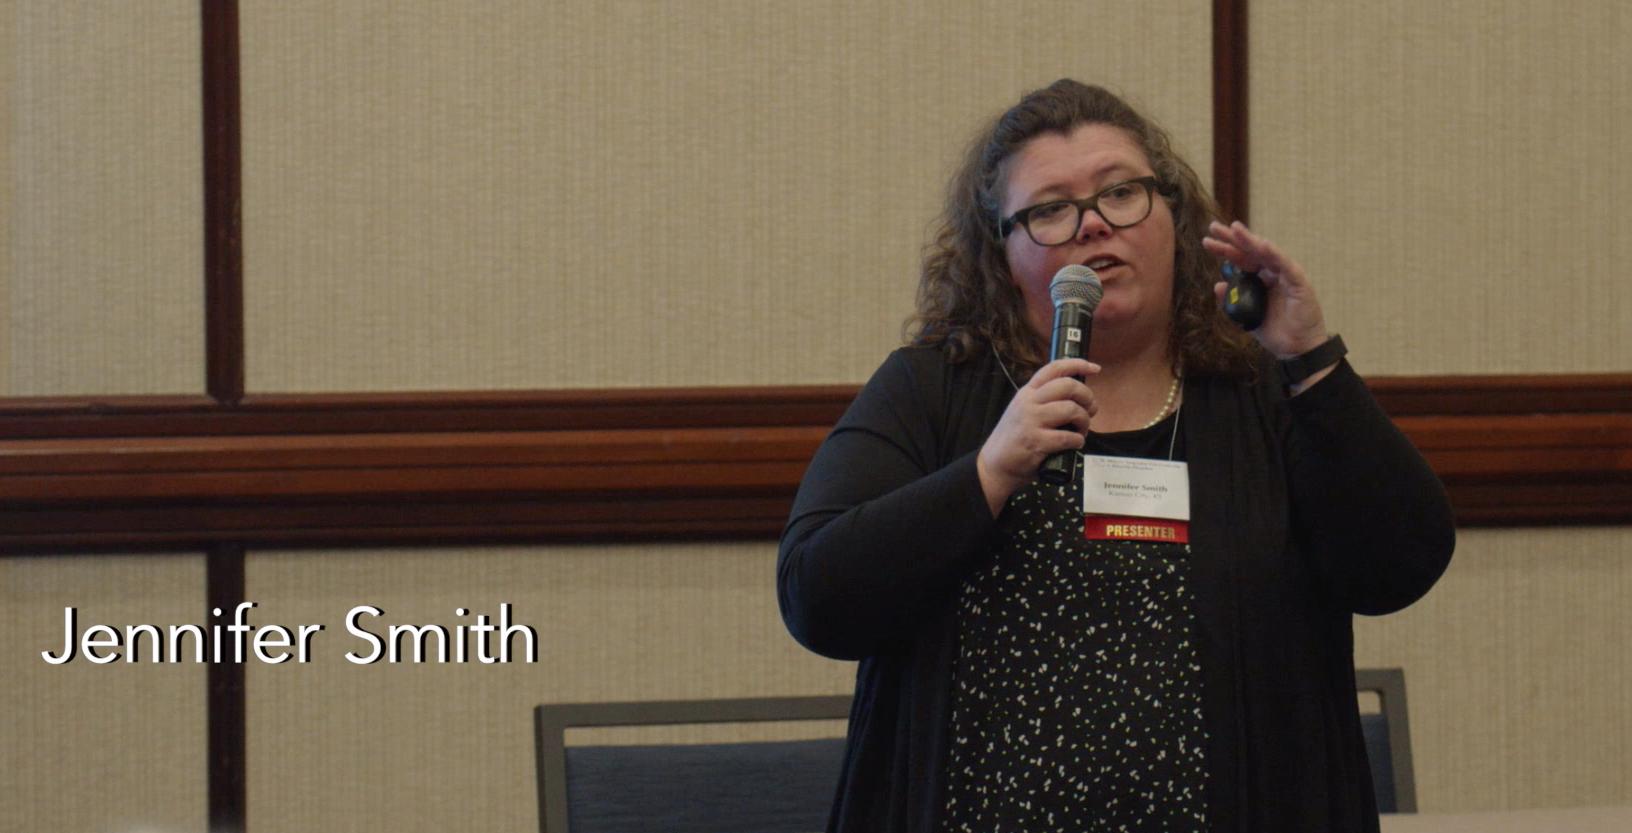 2019 Ignite Session by Jennifer Smith